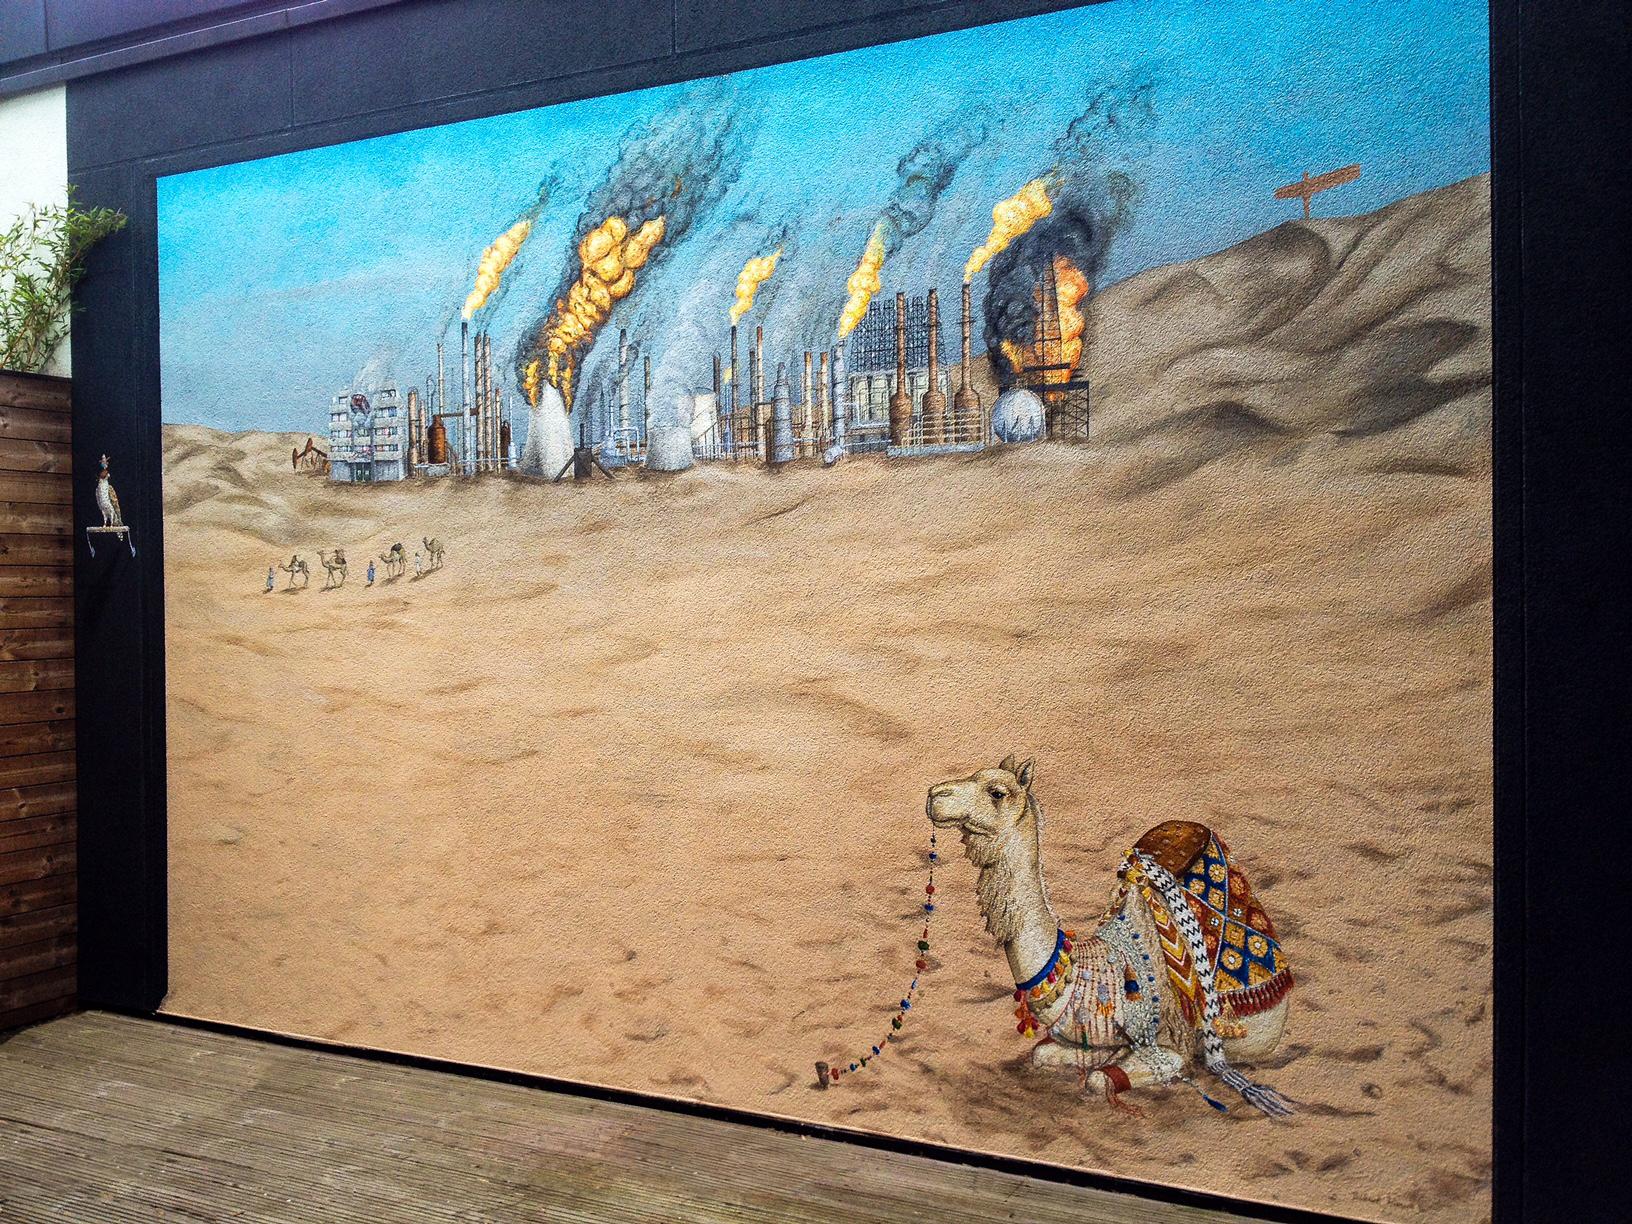 Dystopian desert mural.